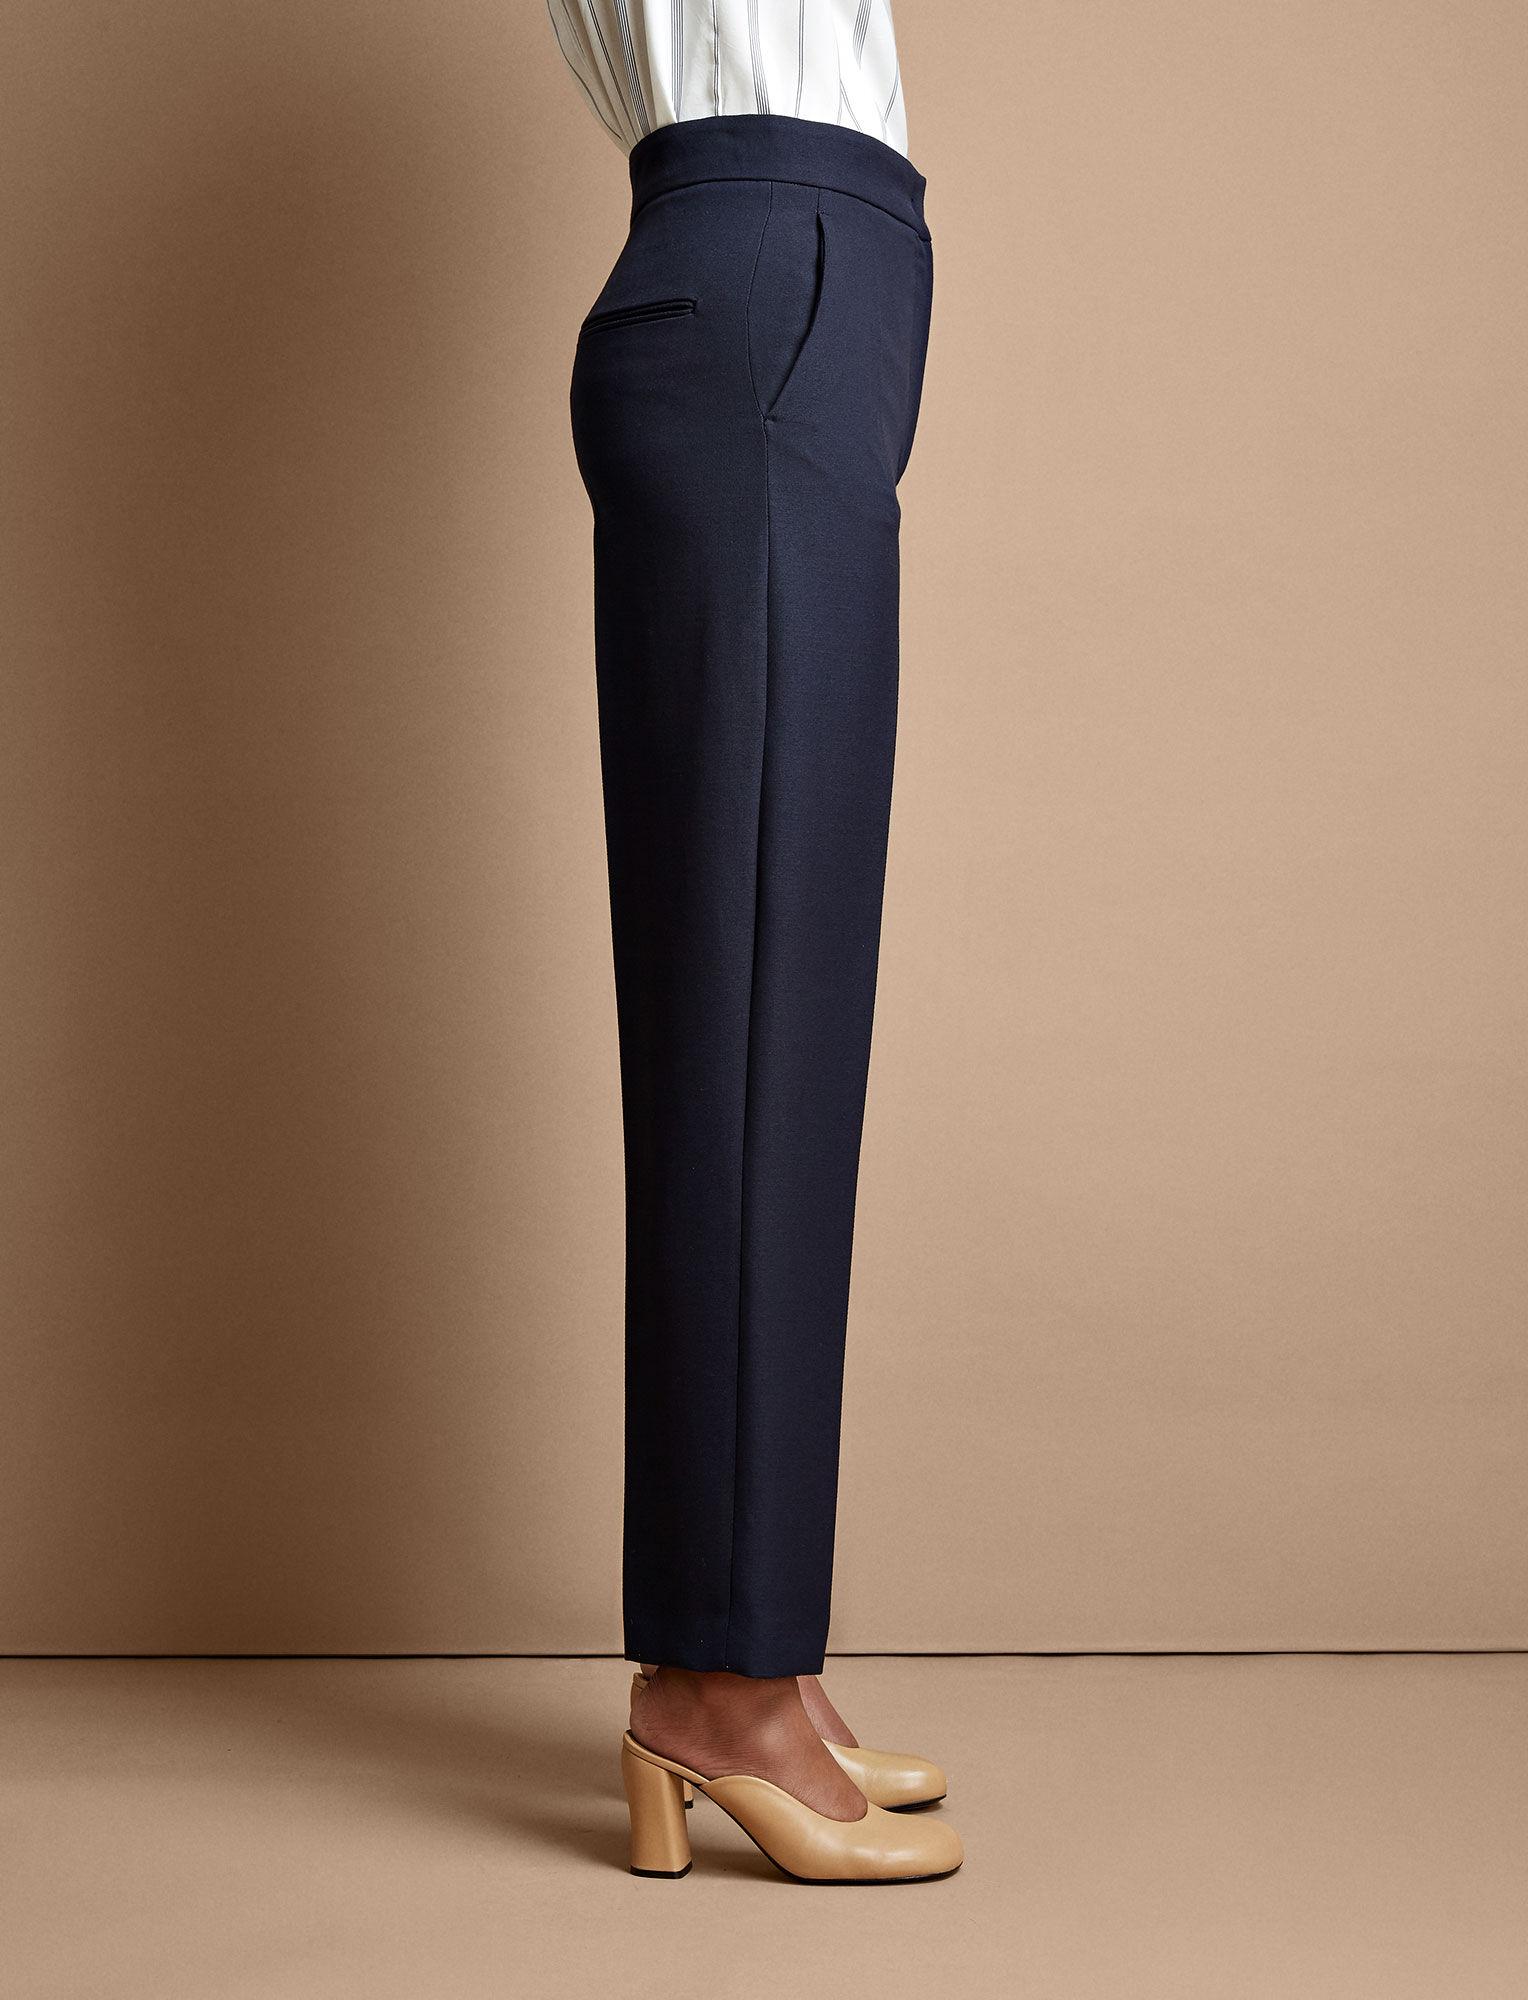 Joseph, Haim Tailoring Canvas Trousers, in NAVY